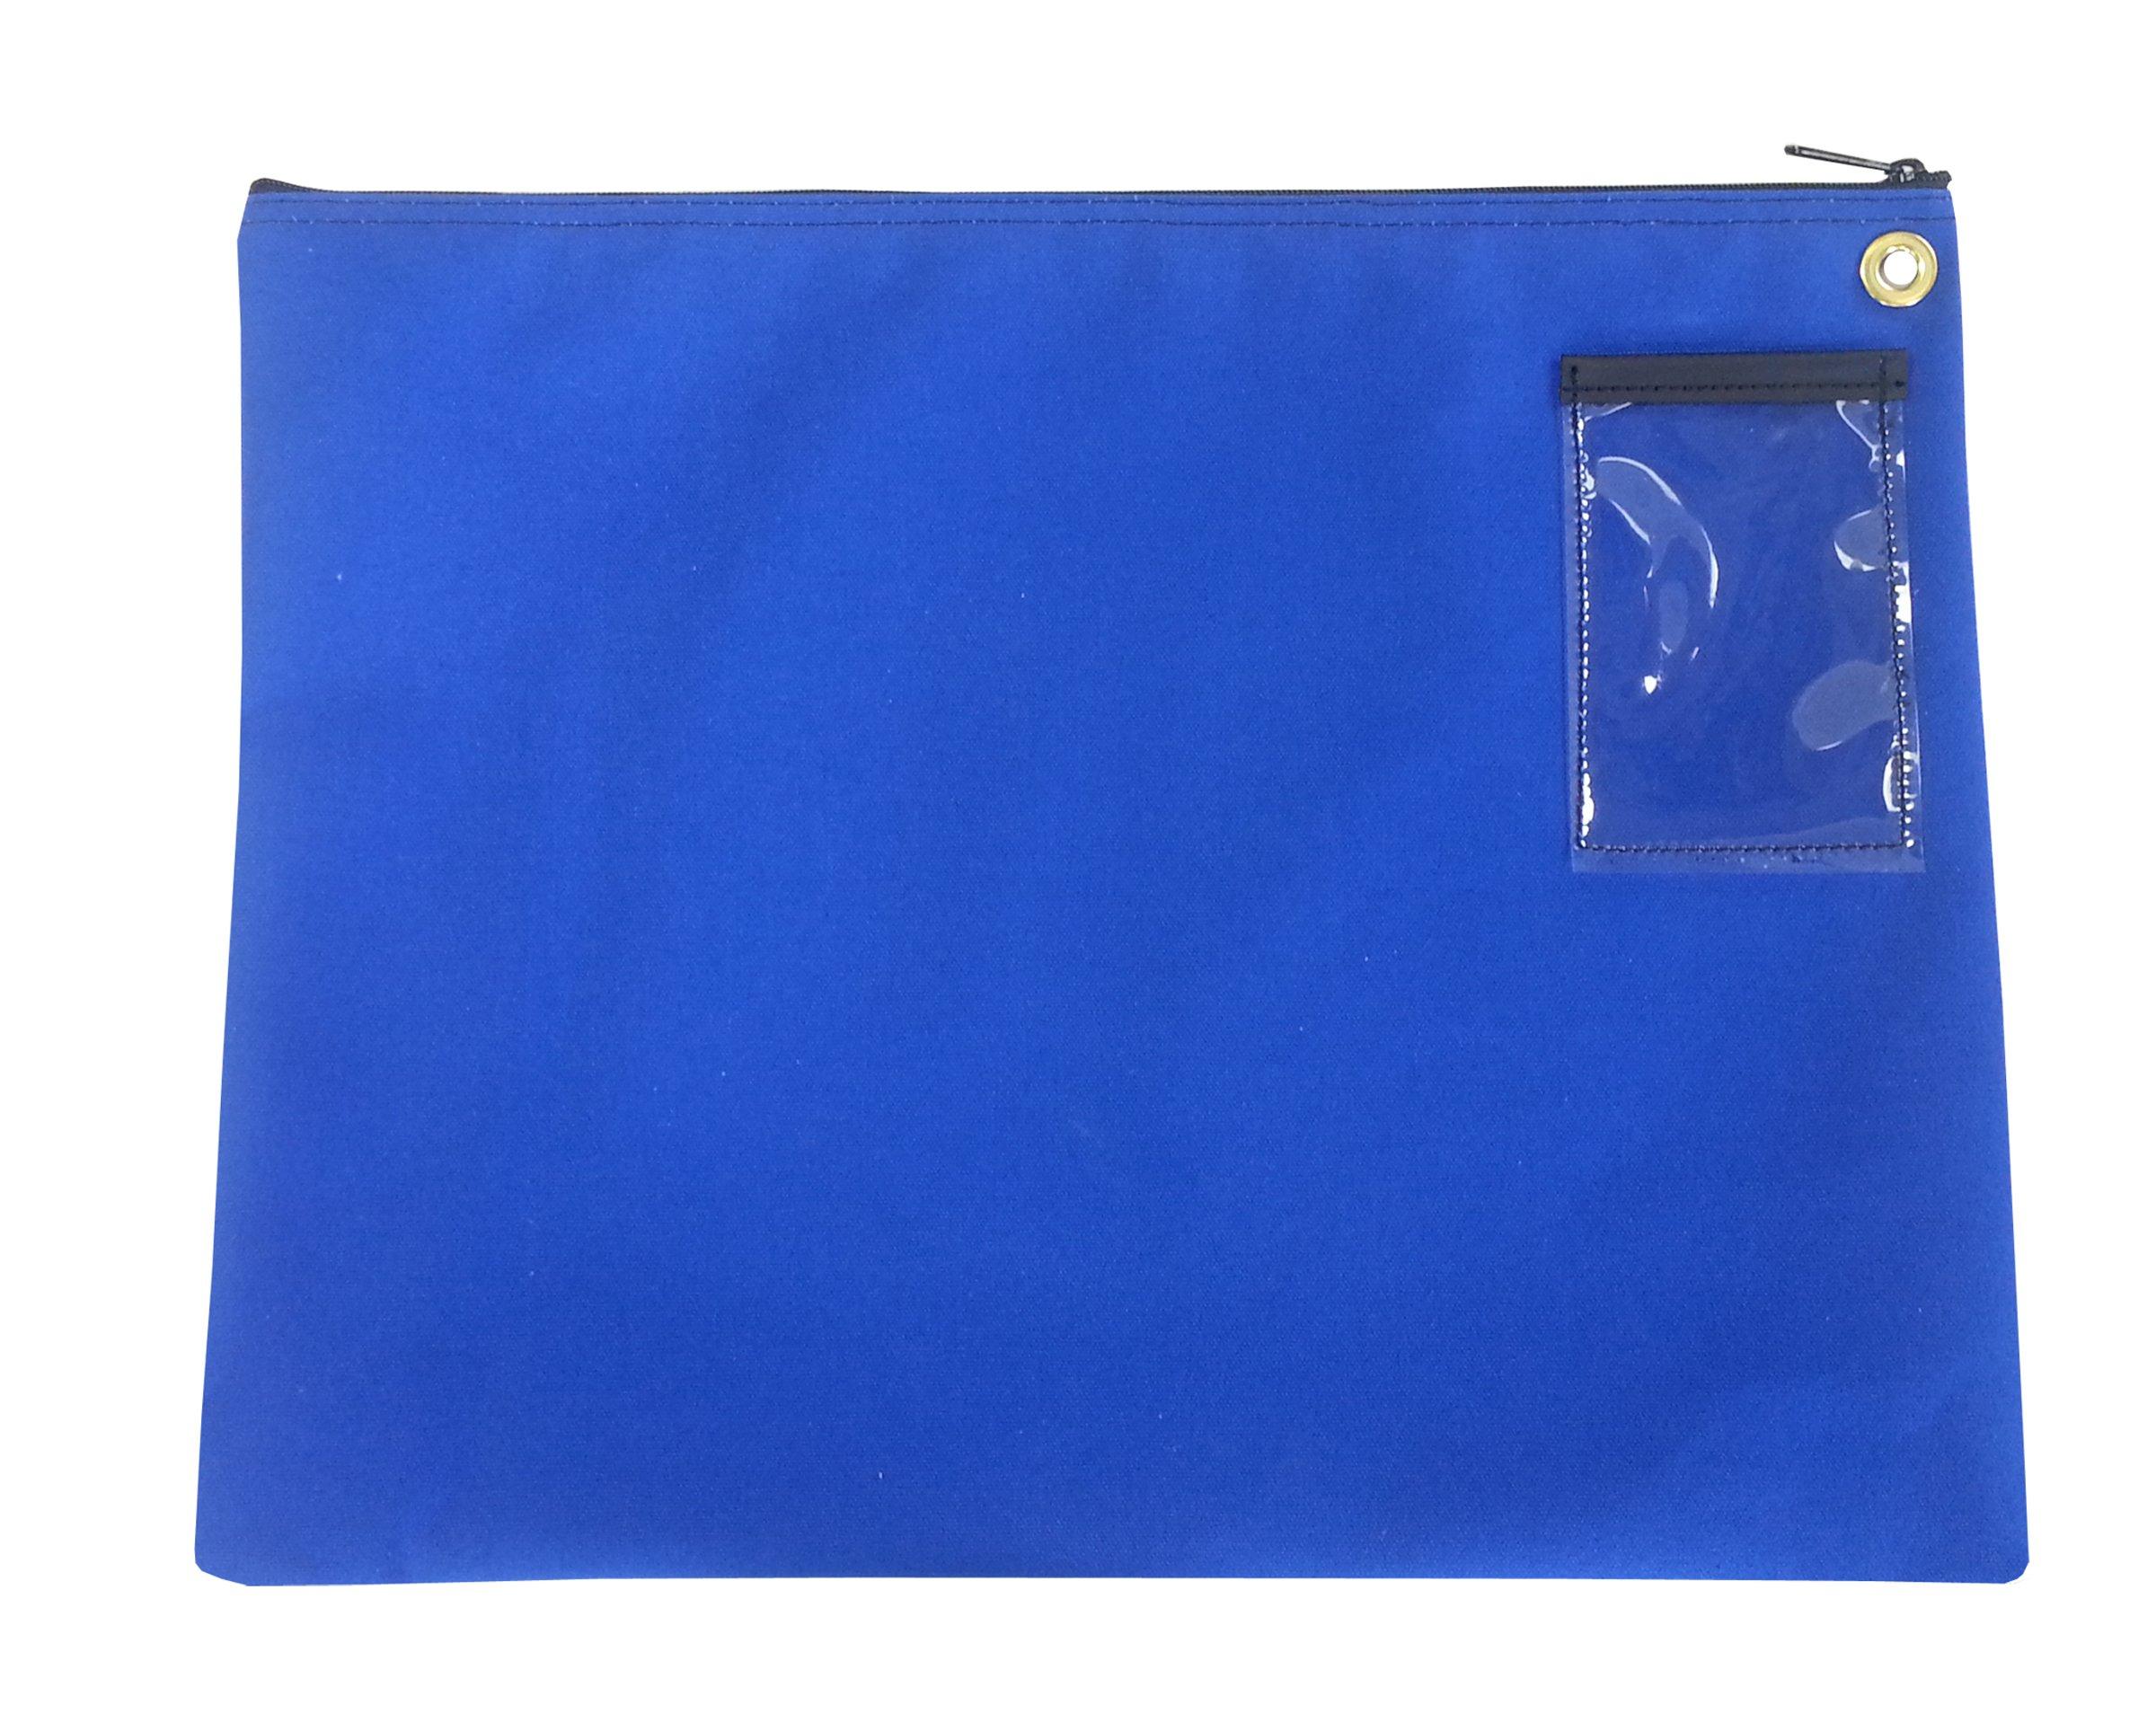 Interoffice Mailer Canvas Transit Bag 14w x 11h (Royal Blue) by Cardinal bag supplies